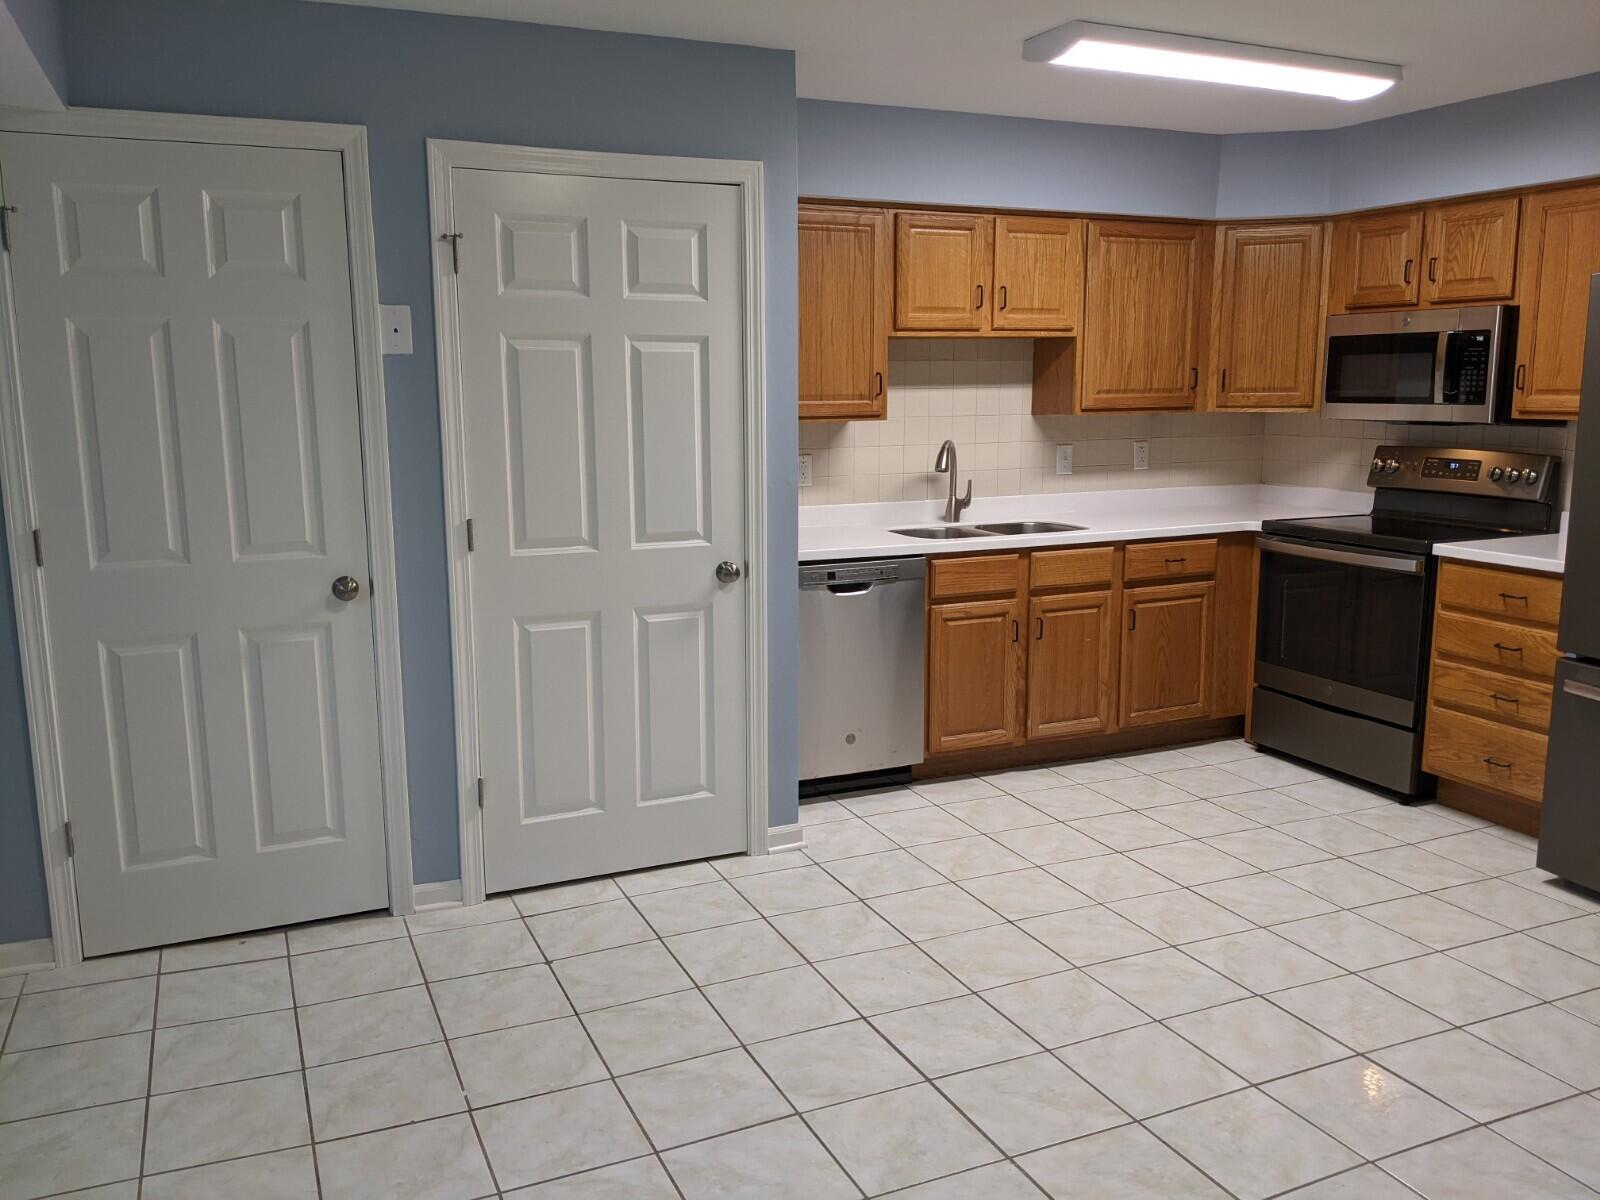 90 Potawatomi Rd, Williams Bay, Wisconsin 53191, 2 Bedrooms Bedrooms, 4 Rooms Rooms,1 BathroomBathrooms,Condominiums,For Sale,Potawatomi Rd,1,1746335